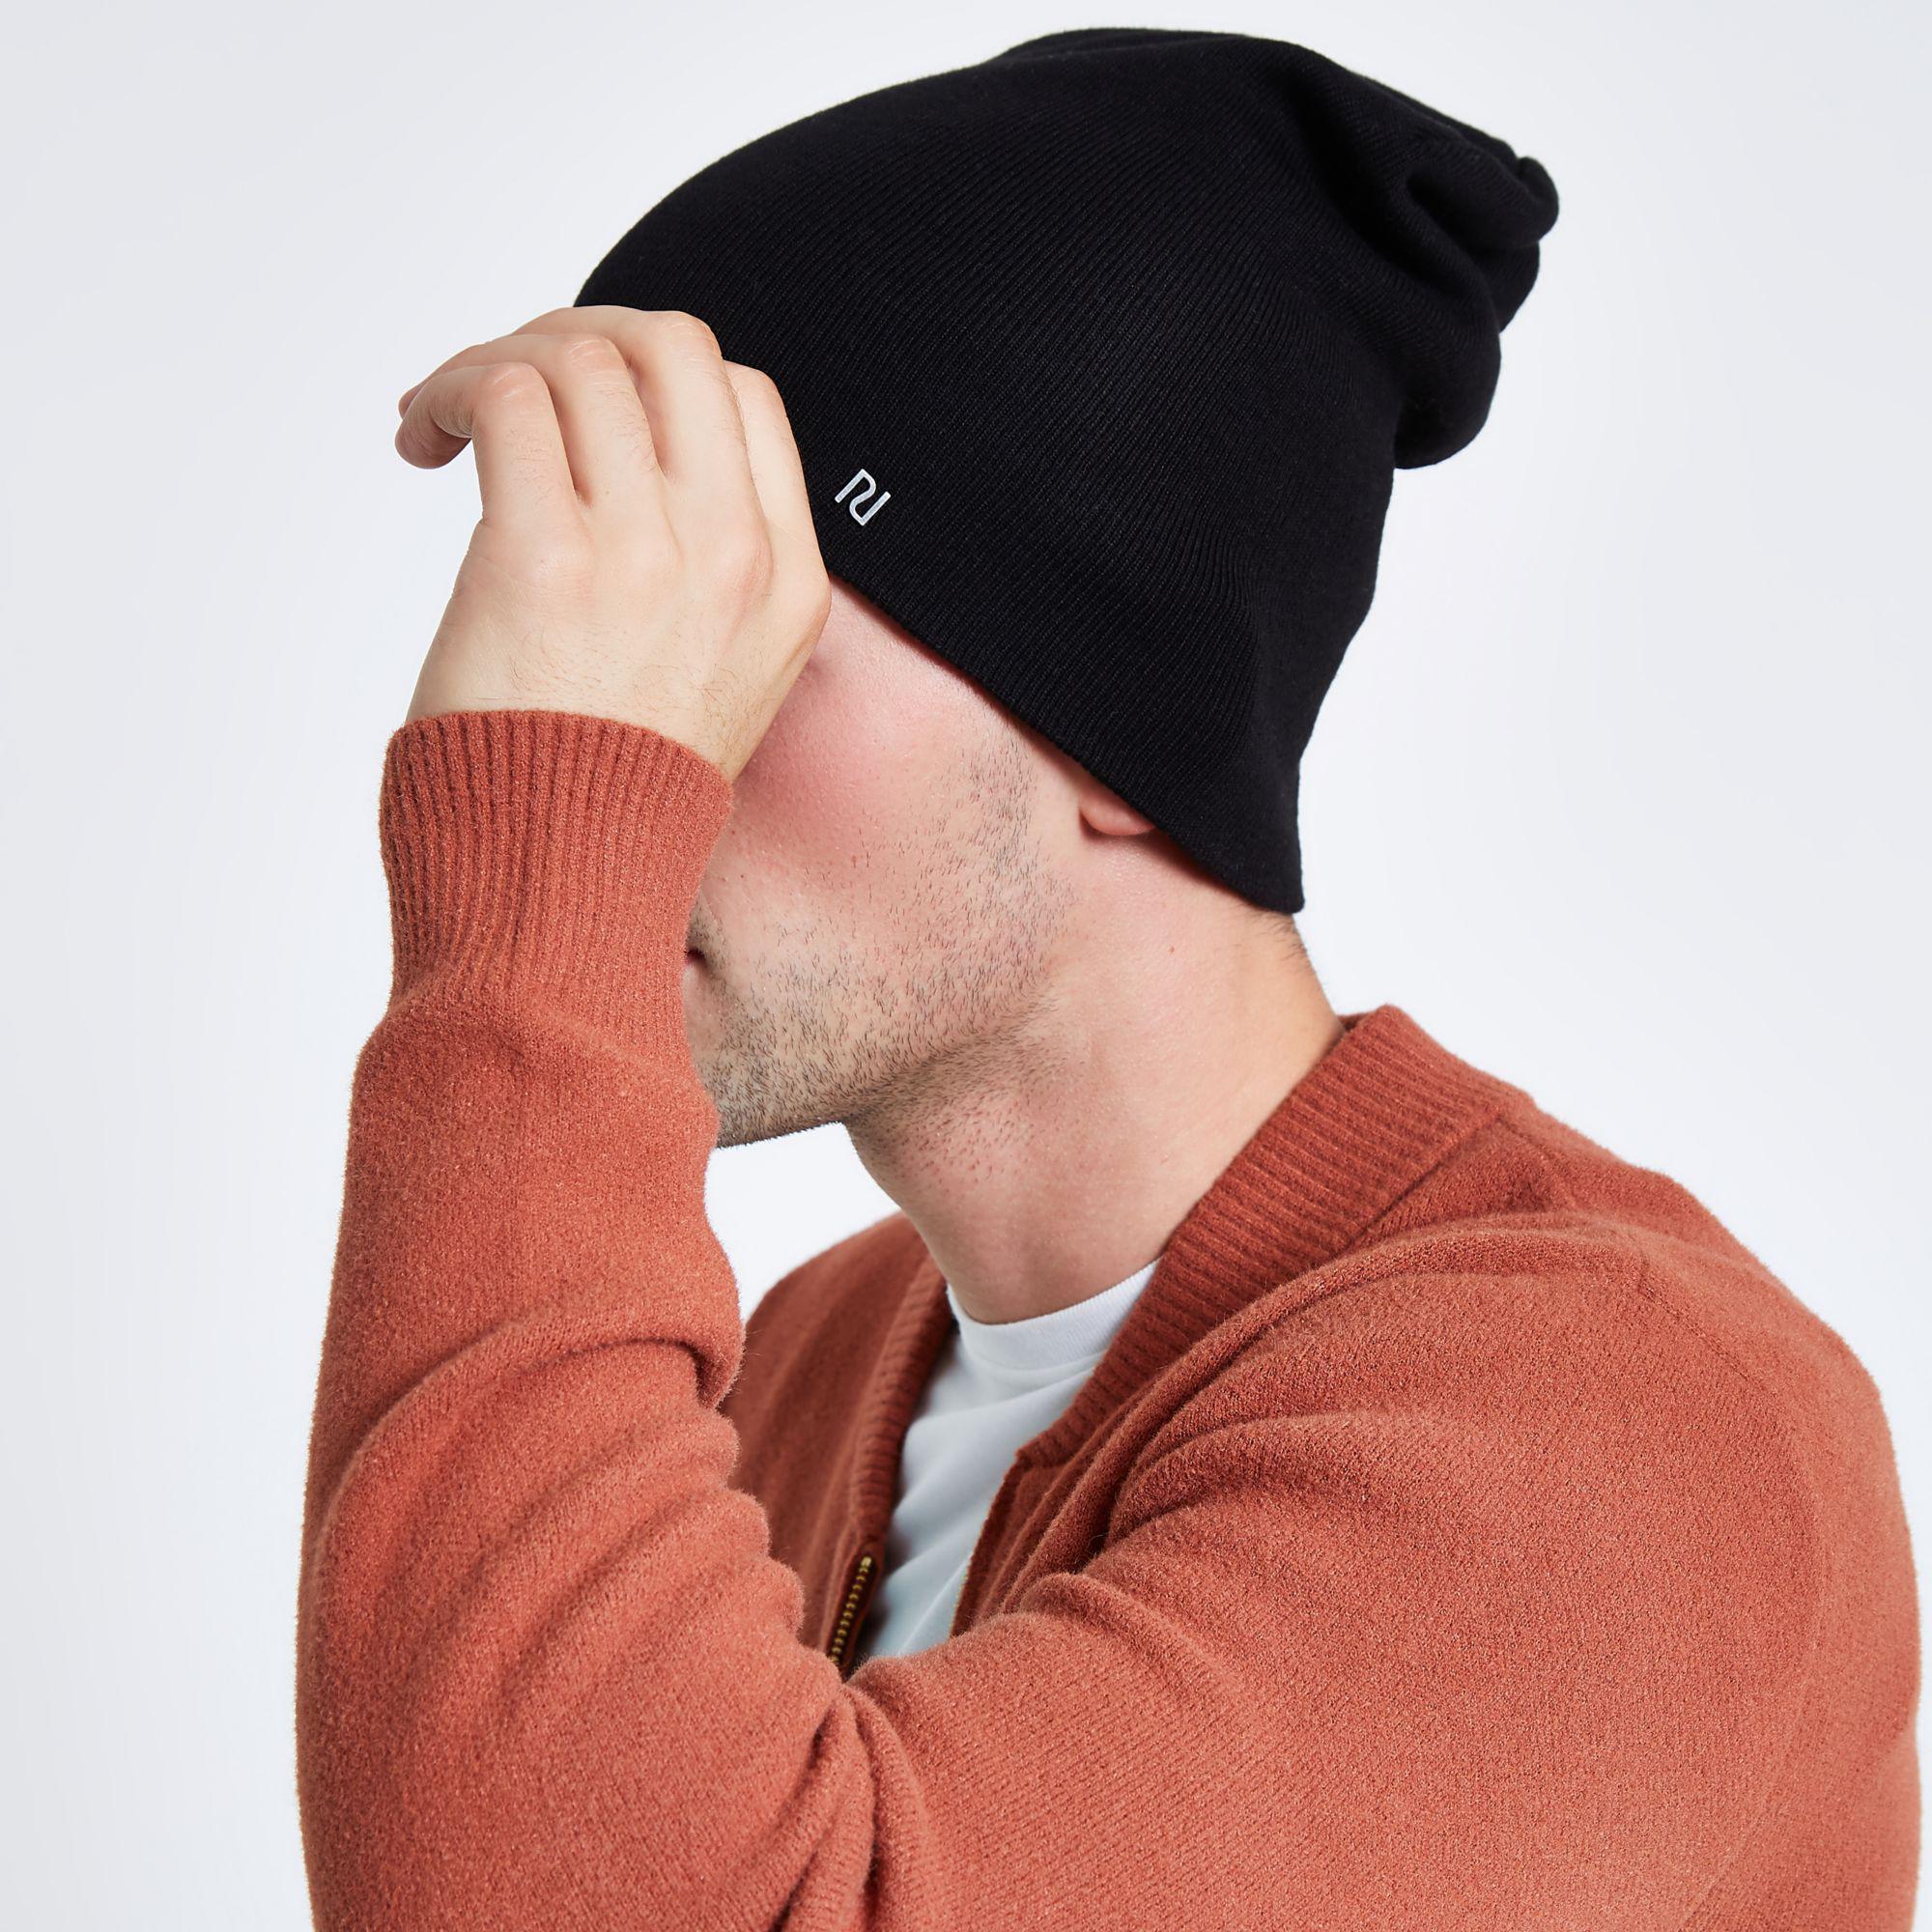 679a61a75f8 River Island - Black Slouch Beanie Ri Hat for Men - Lyst. View fullscreen